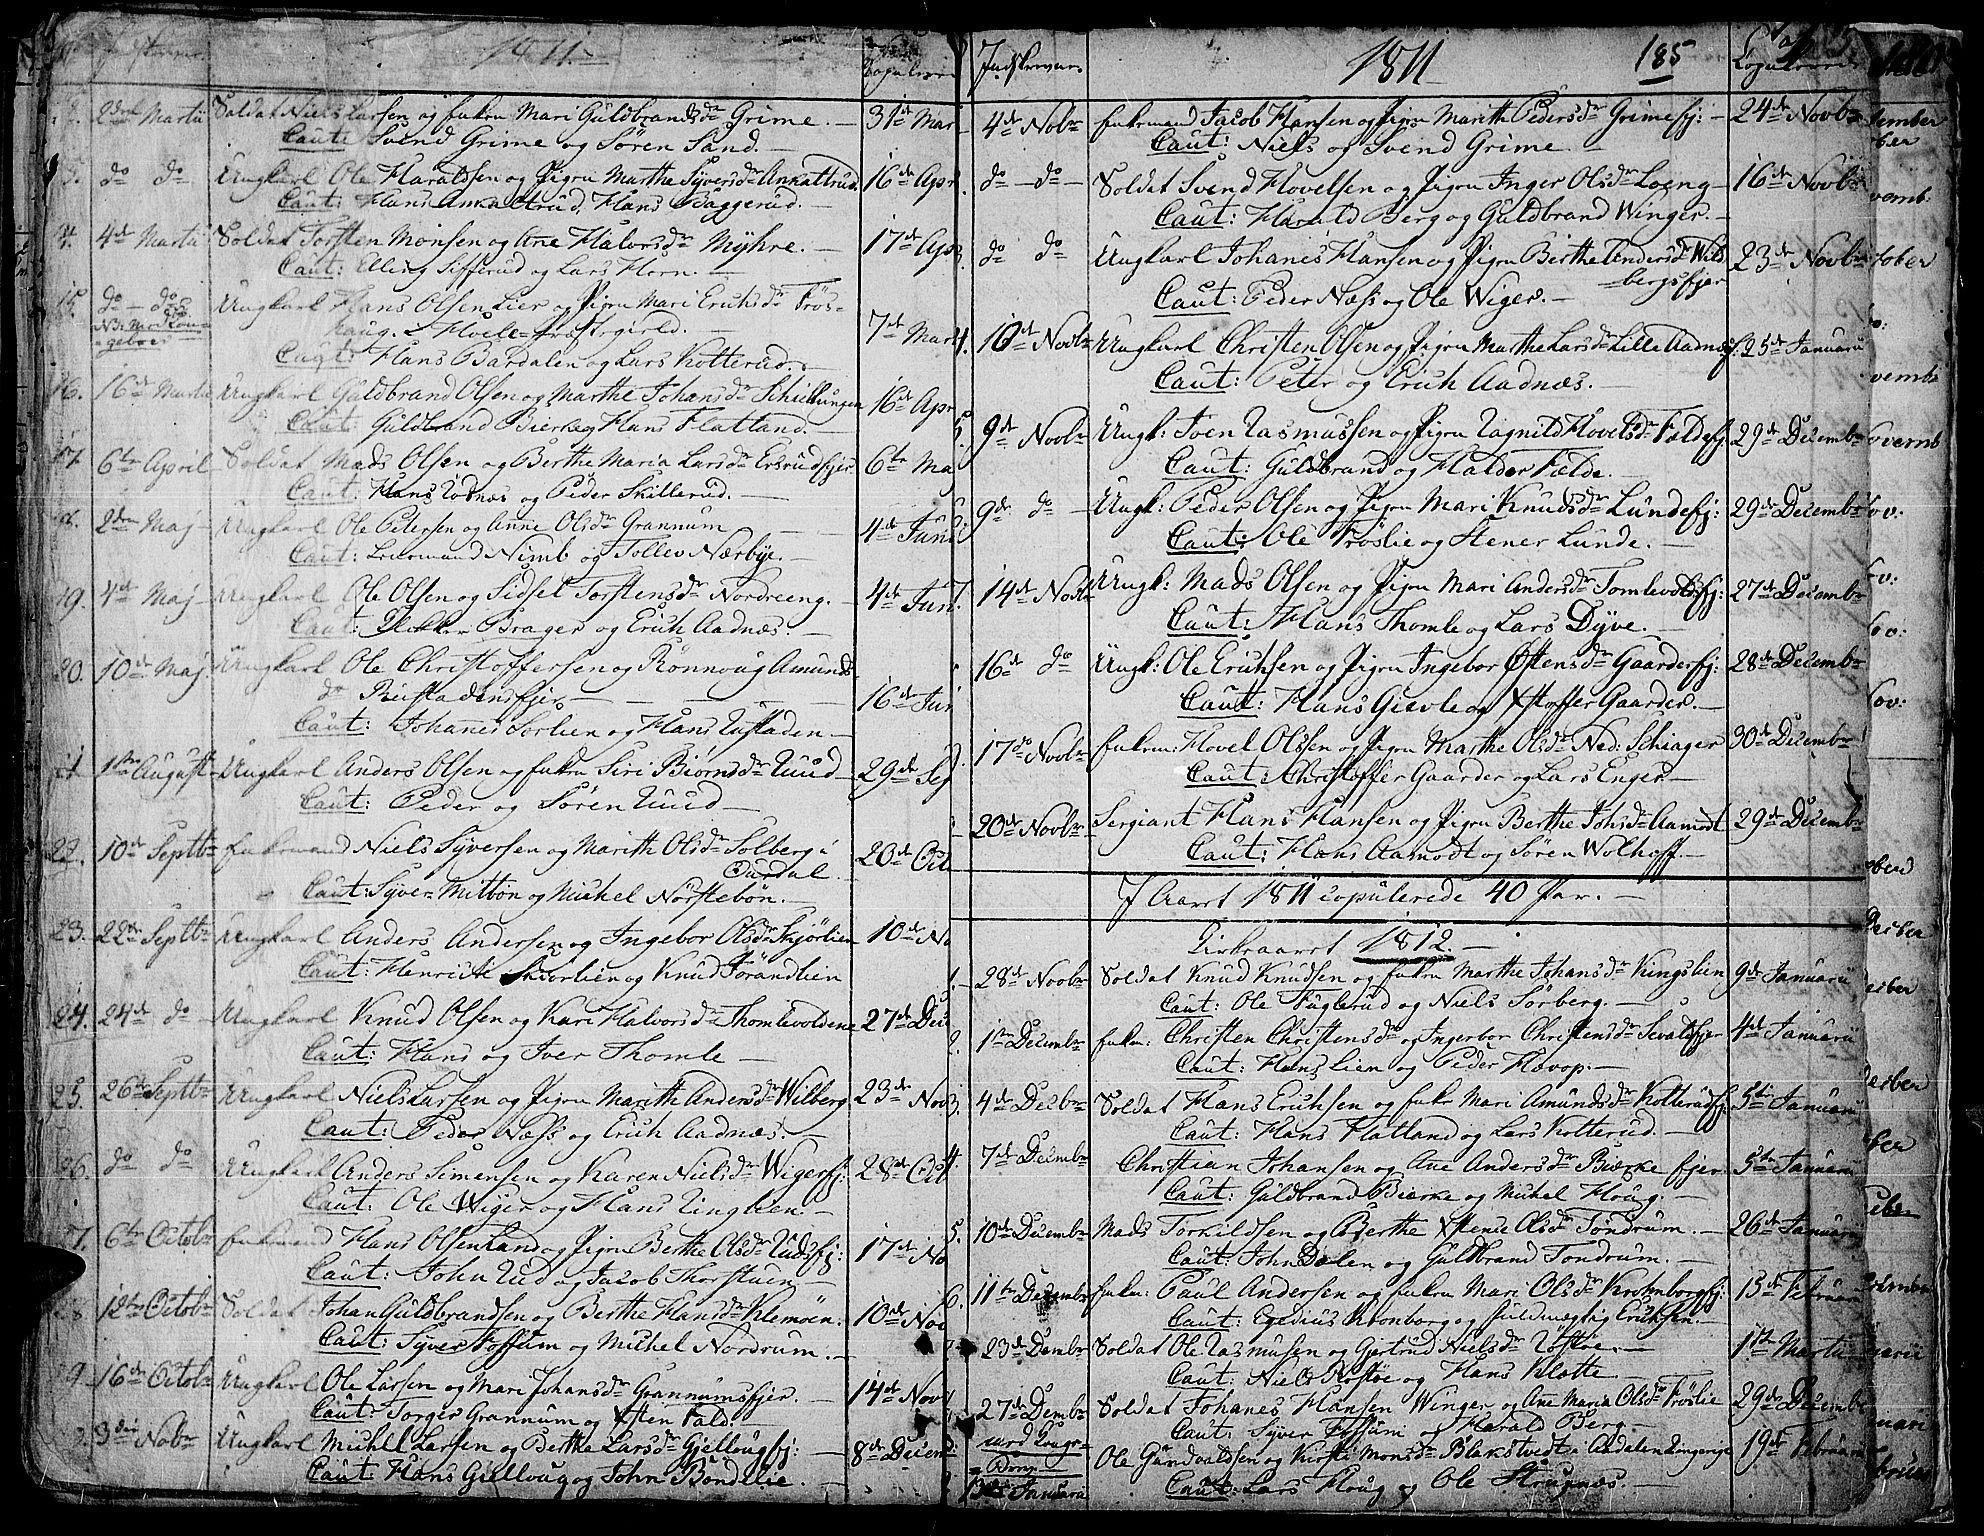 SAH, Land prestekontor, Ministerialbok nr. 6, 1784-1813, s. 185